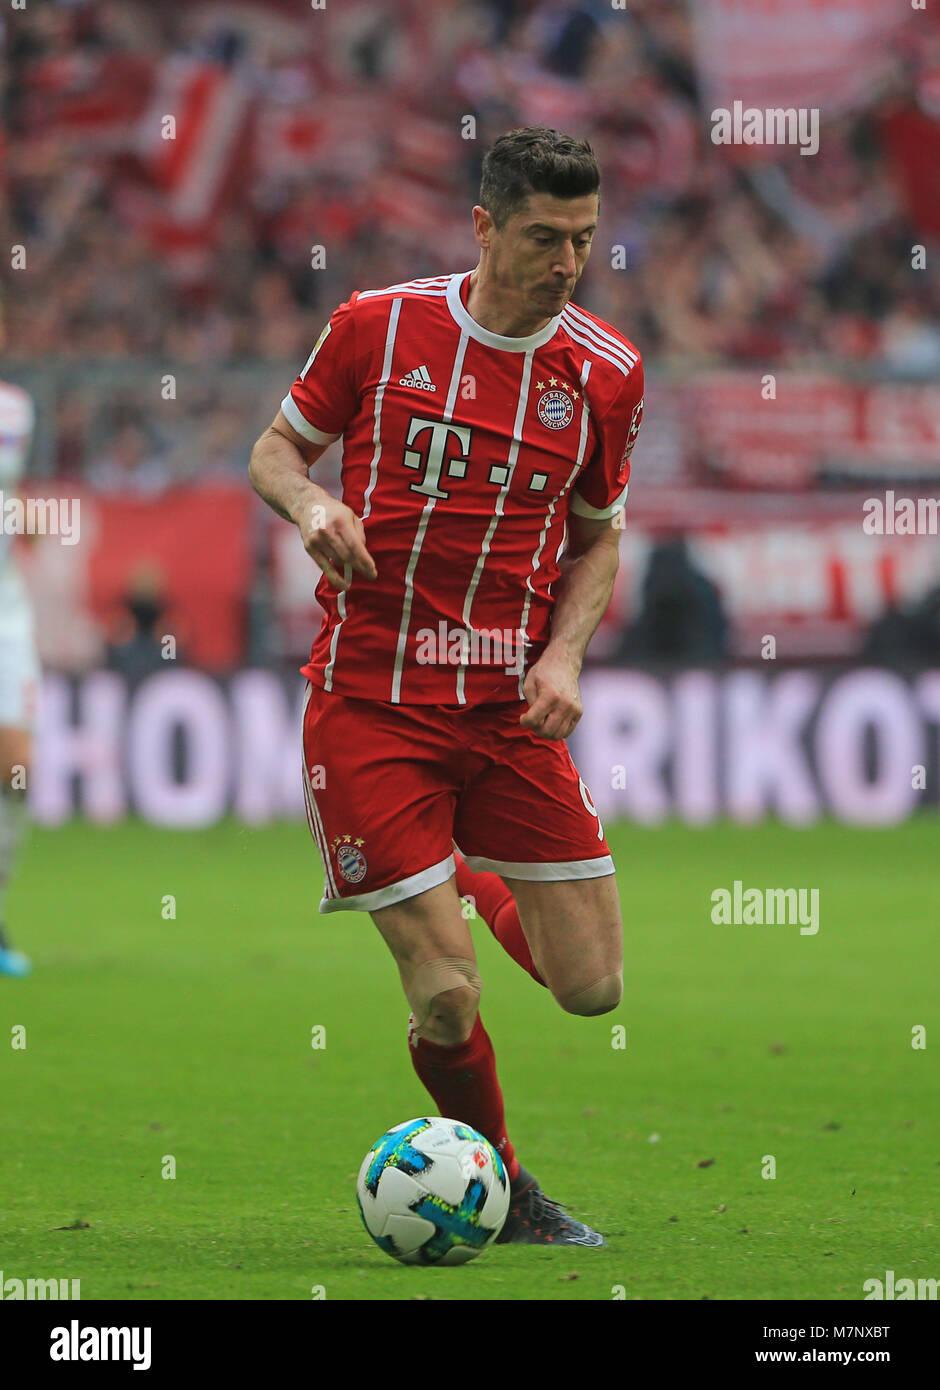 20180310, Football, 1. Bundesliga, 26.Matchday, at Allianz Arena Munich, FC Bayern vs Hamburg SV, Fussball, Sport, Stock Photo